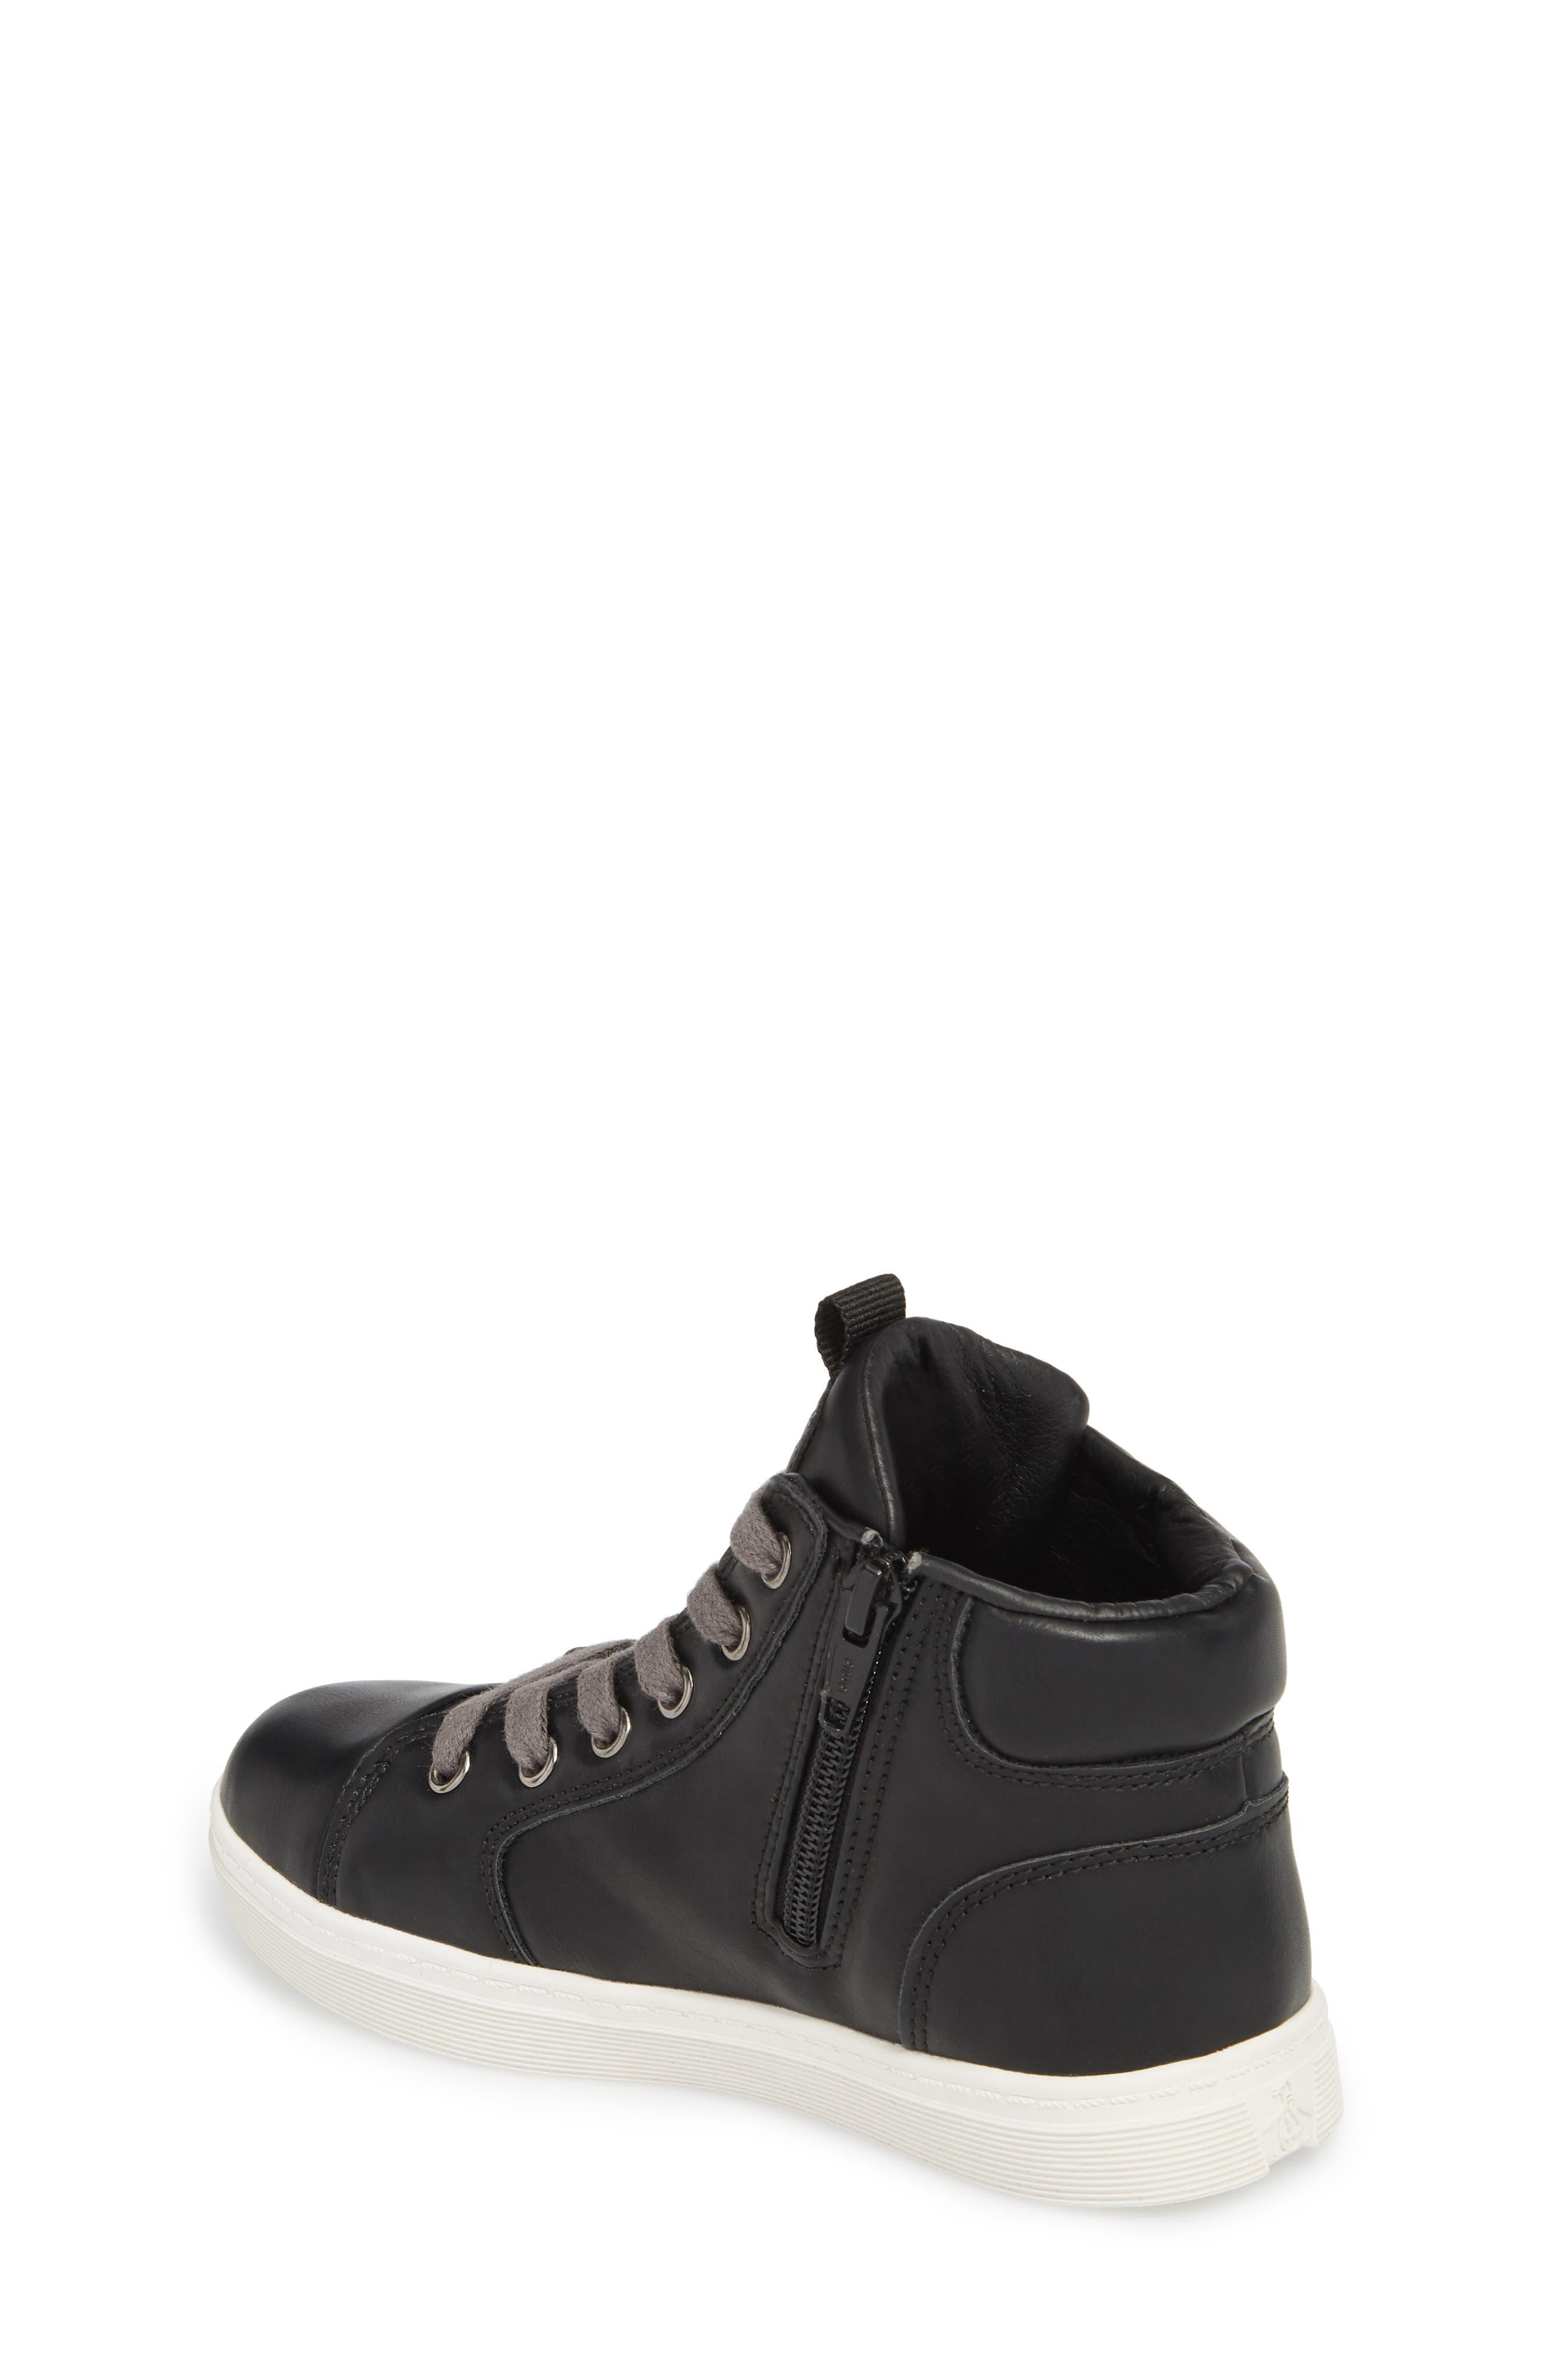 Carson High Top Sneaker,                             Alternate thumbnail 2, color,                             BLACK